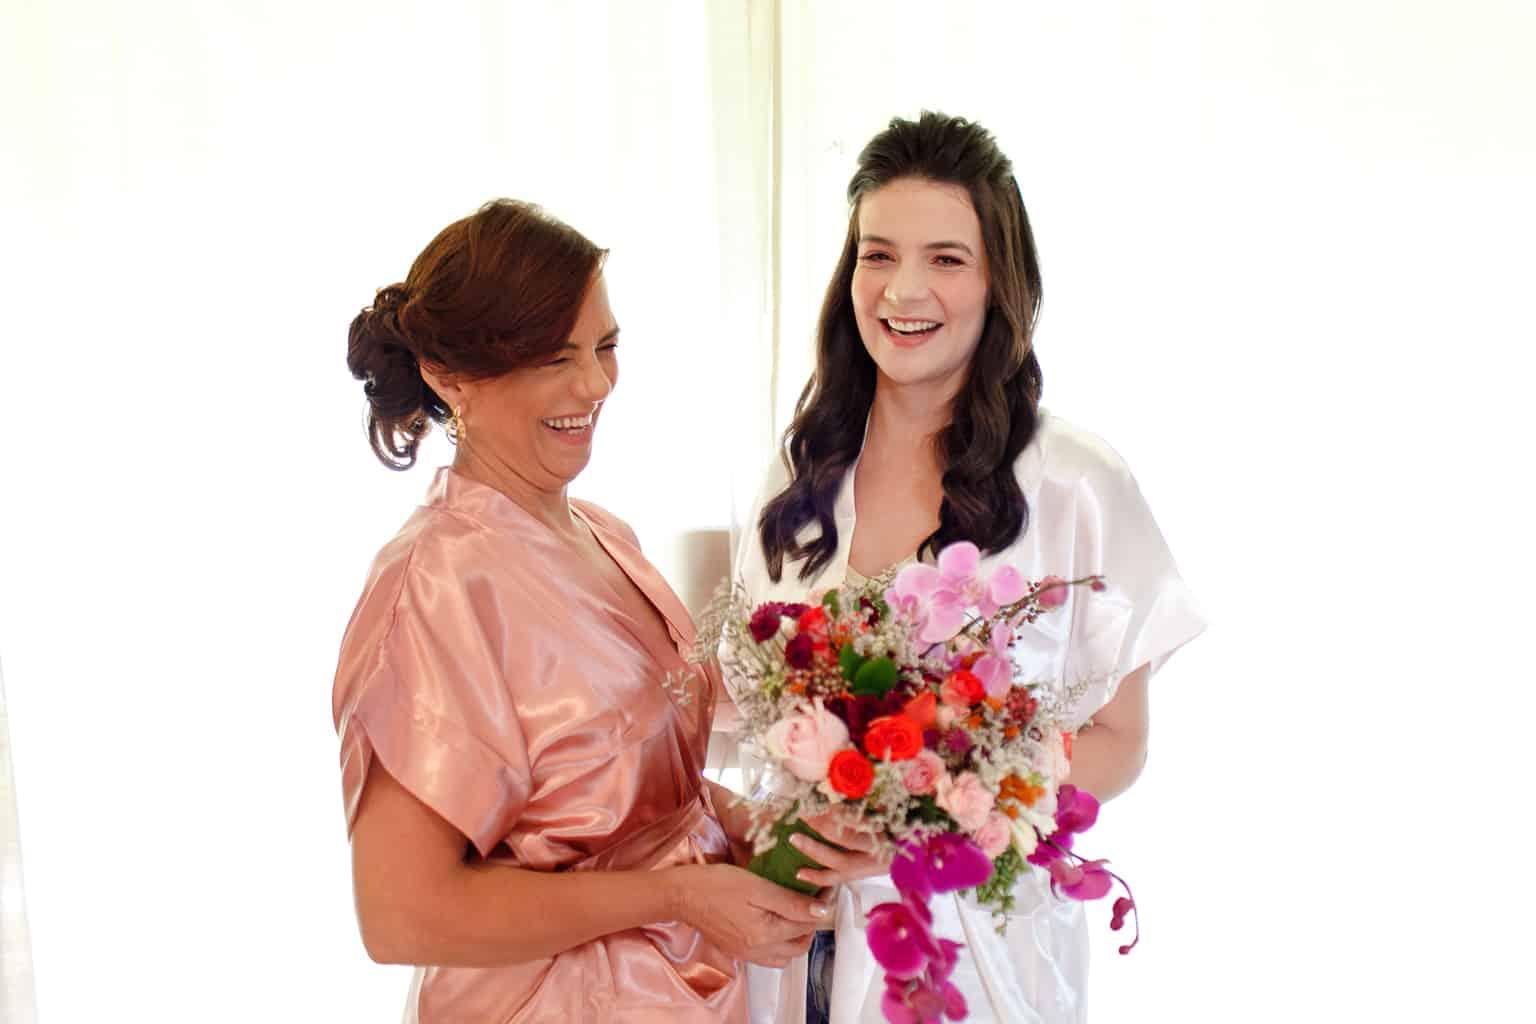 Casamento-Emanuelle-e-Alysson-Fotografia-Tadeu-Nanó-e-Luca-Antunes-351